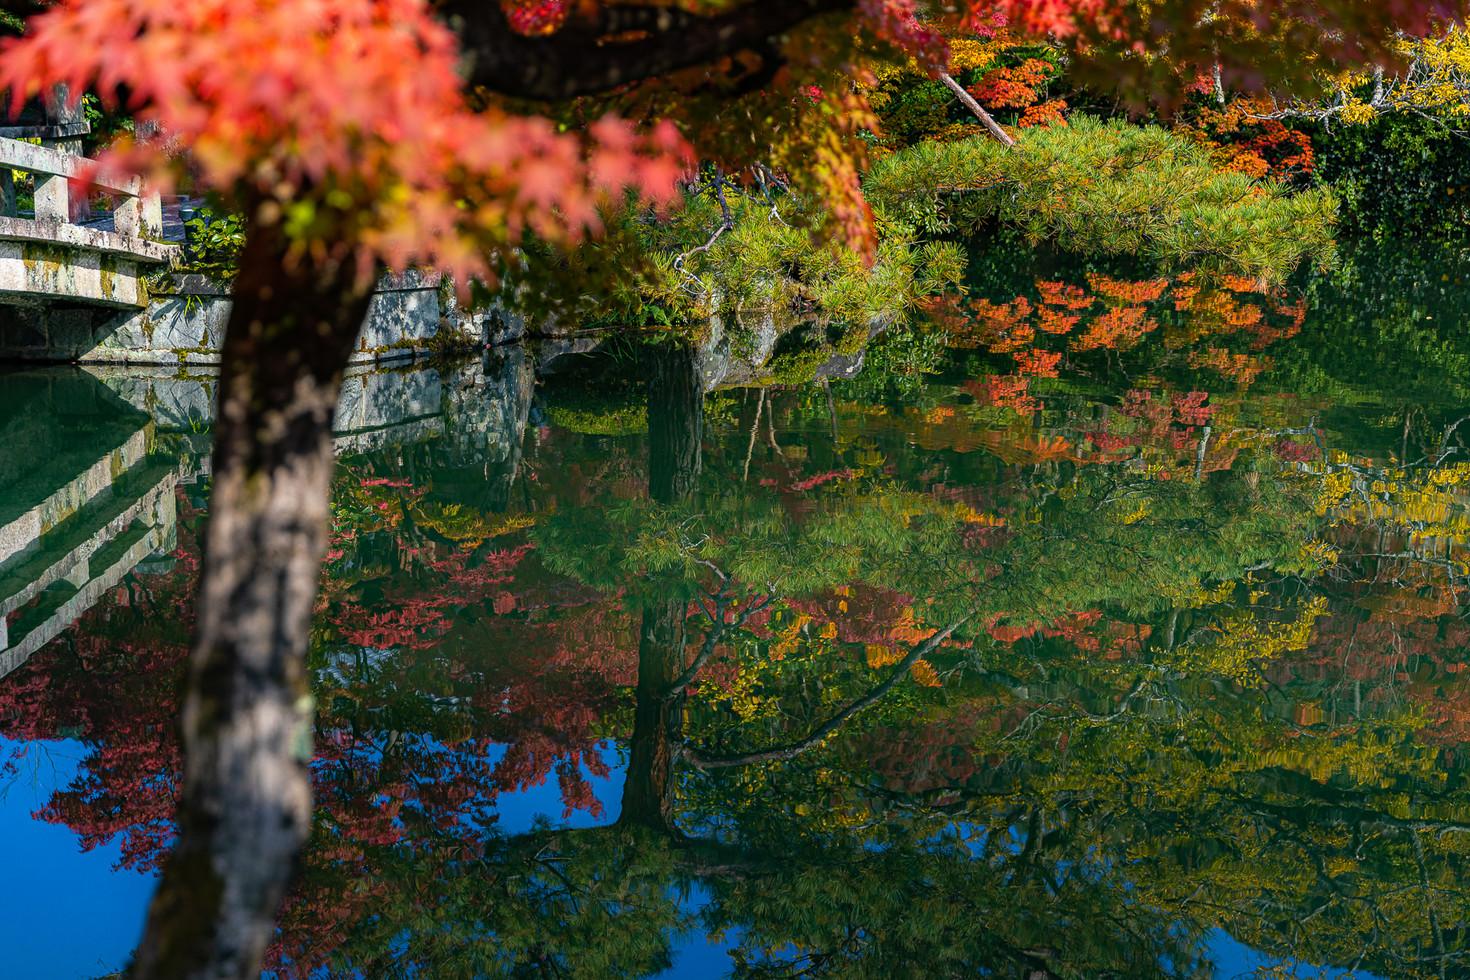 TKPA-Kyoto201911-0208-HDWH.jpg